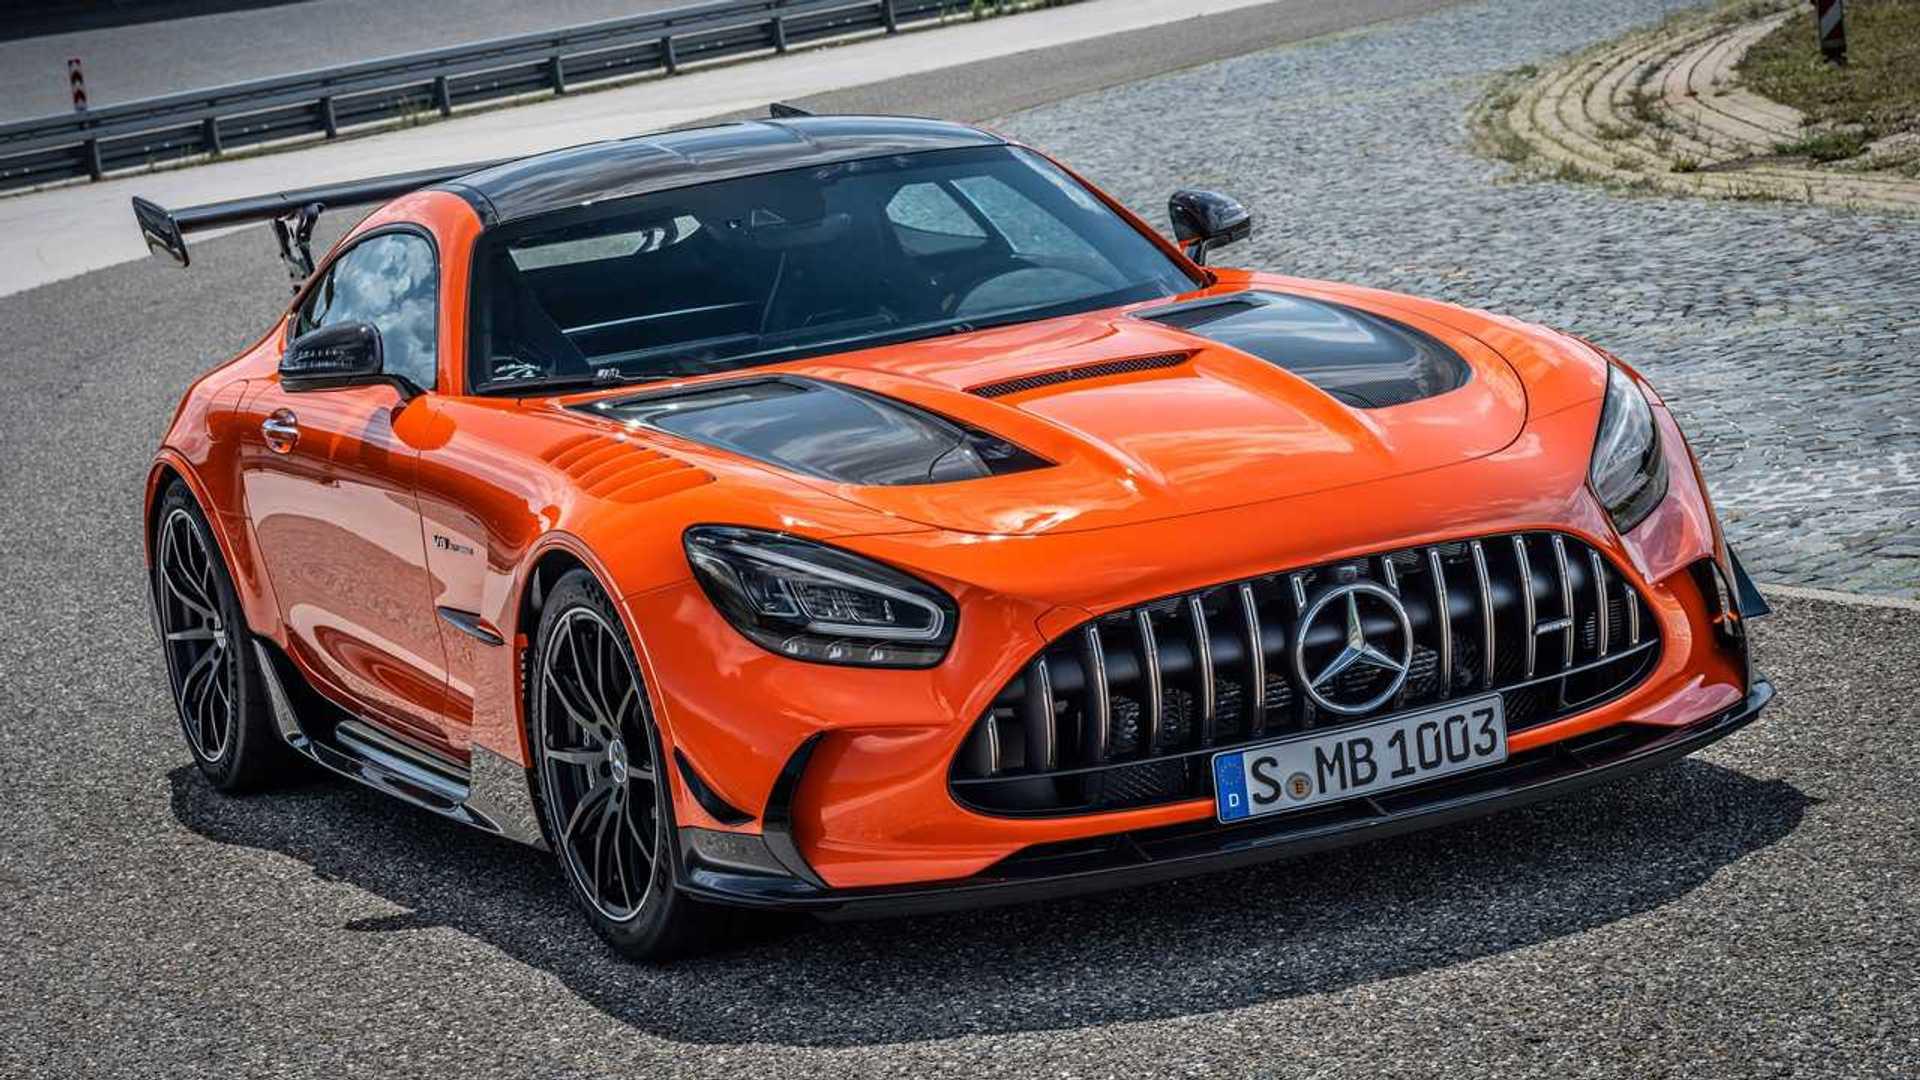 2014 - [Mercedes-AMG] GT [C190] - Page 33 2021-mercedes-amg-gt-black-series-magma-beam